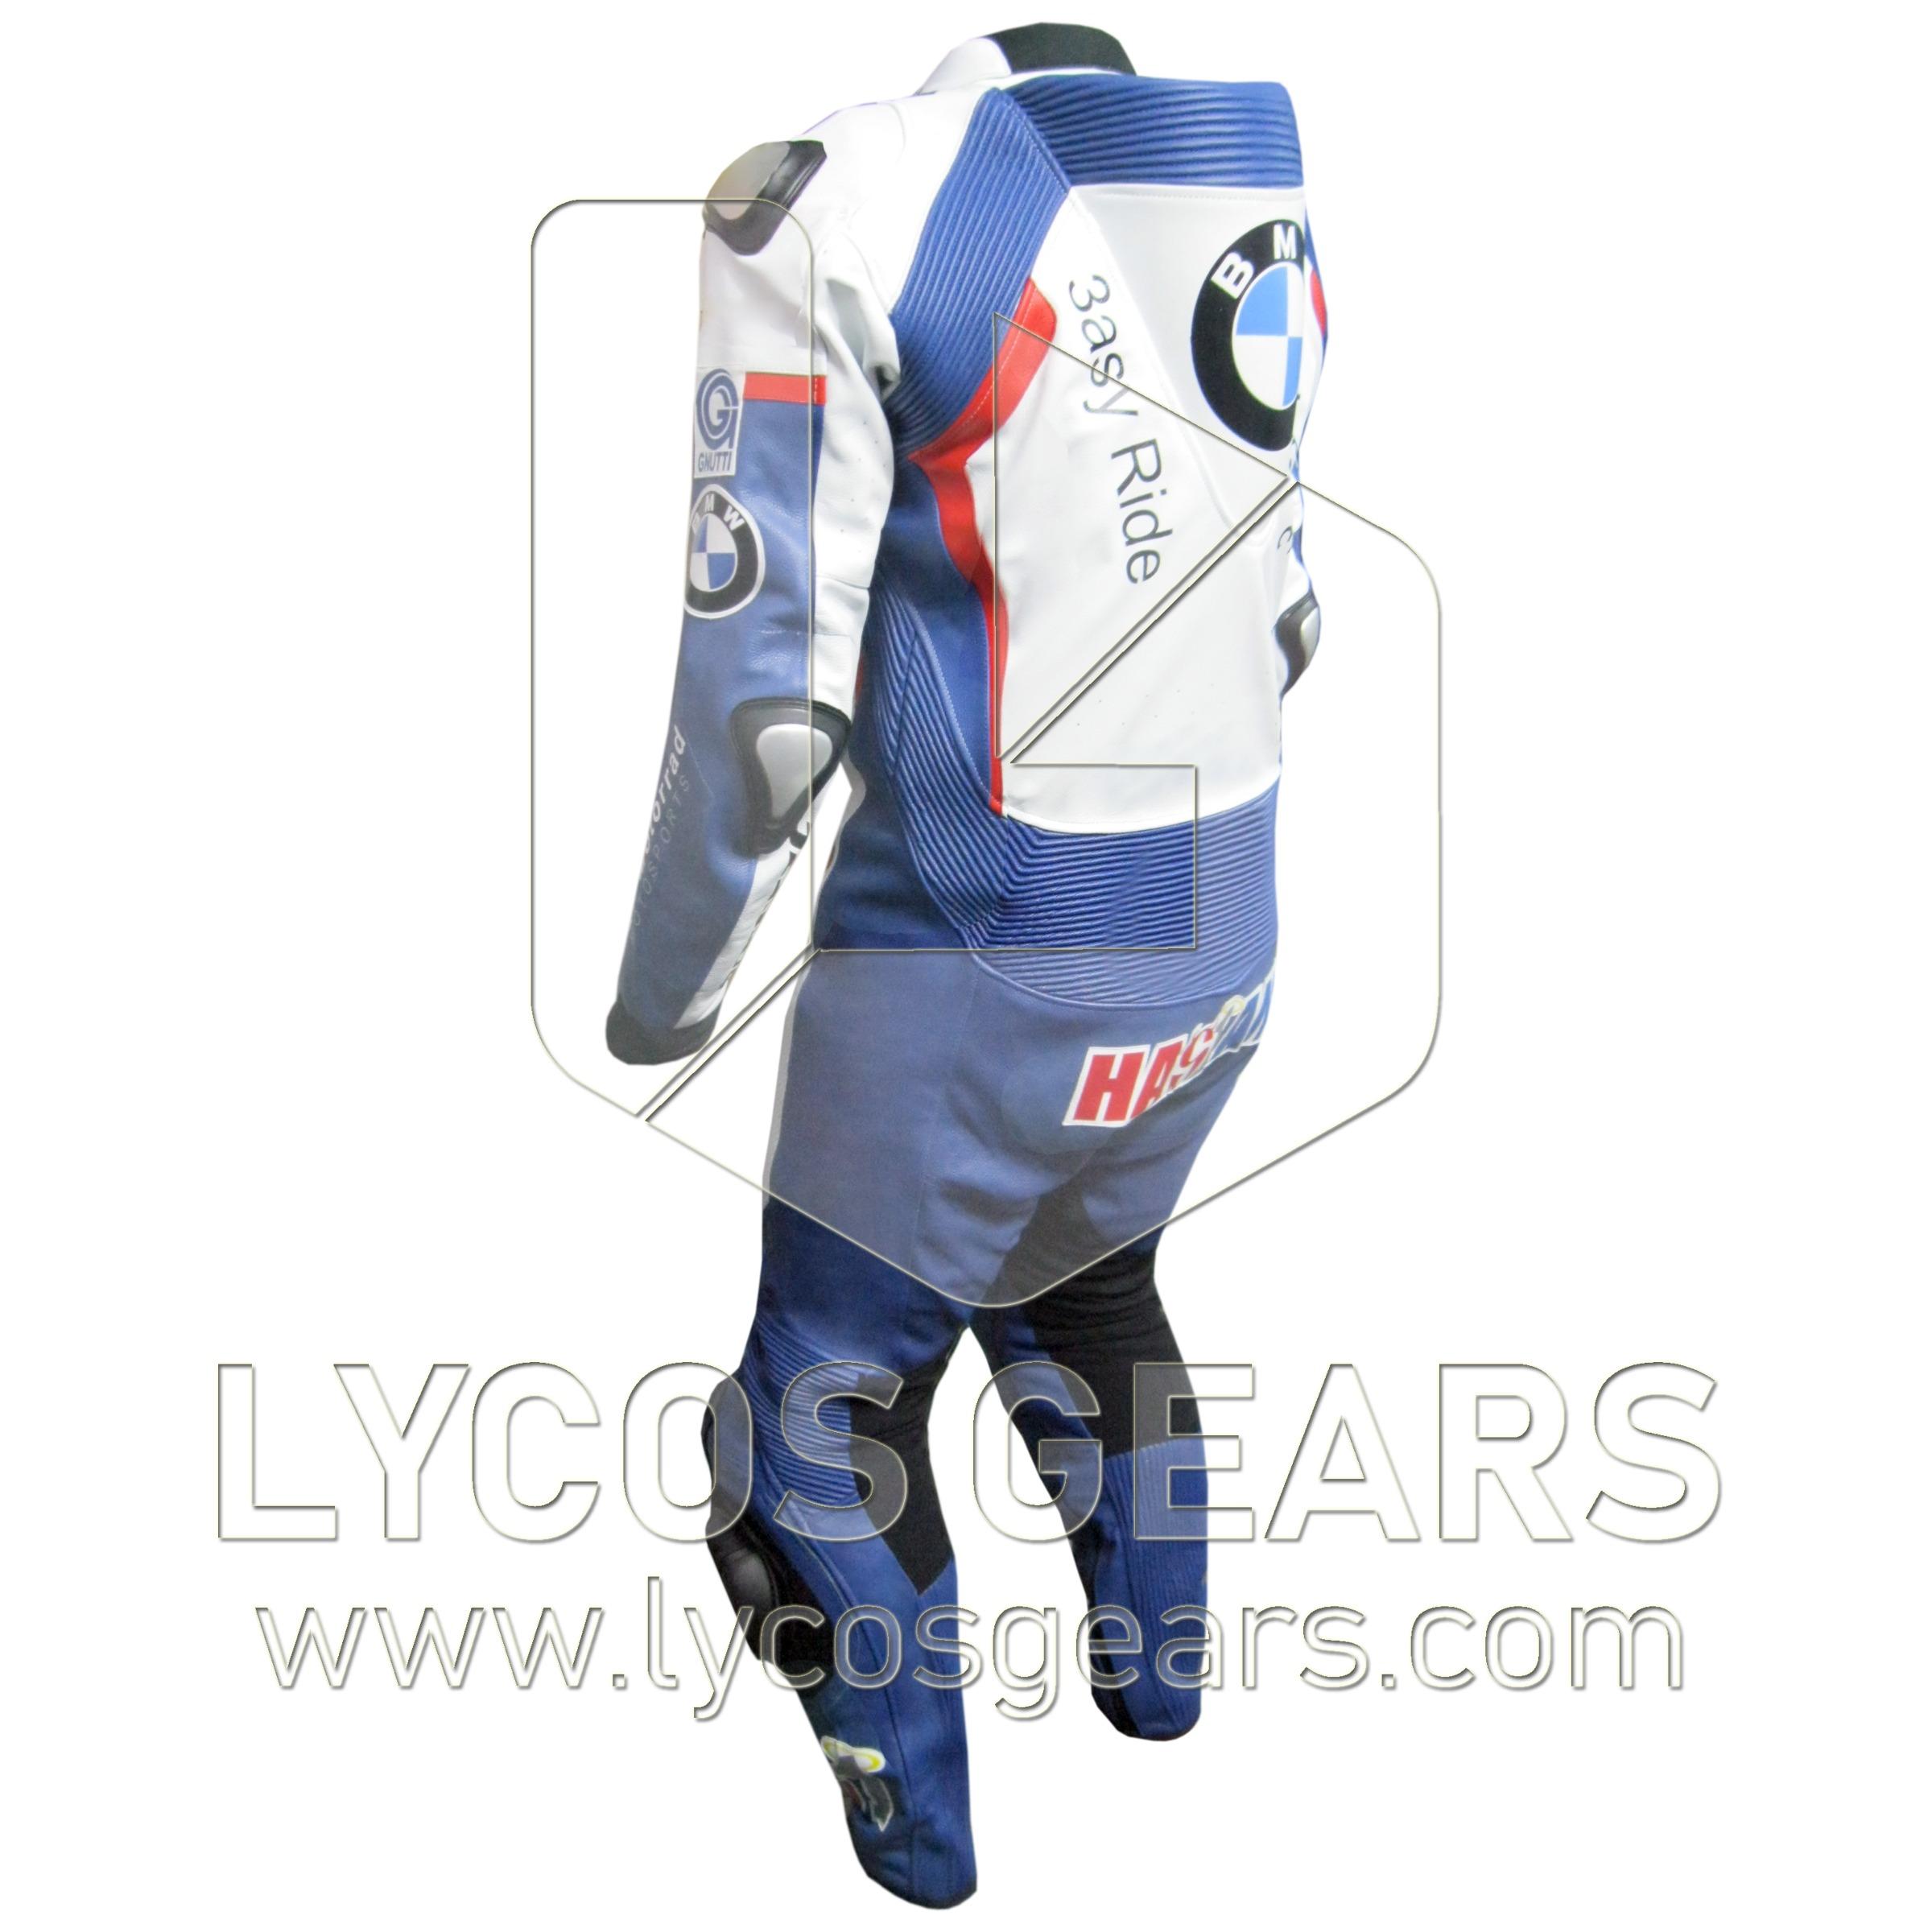 Leon Haslam BMW Motorbike Racing Leather Suit